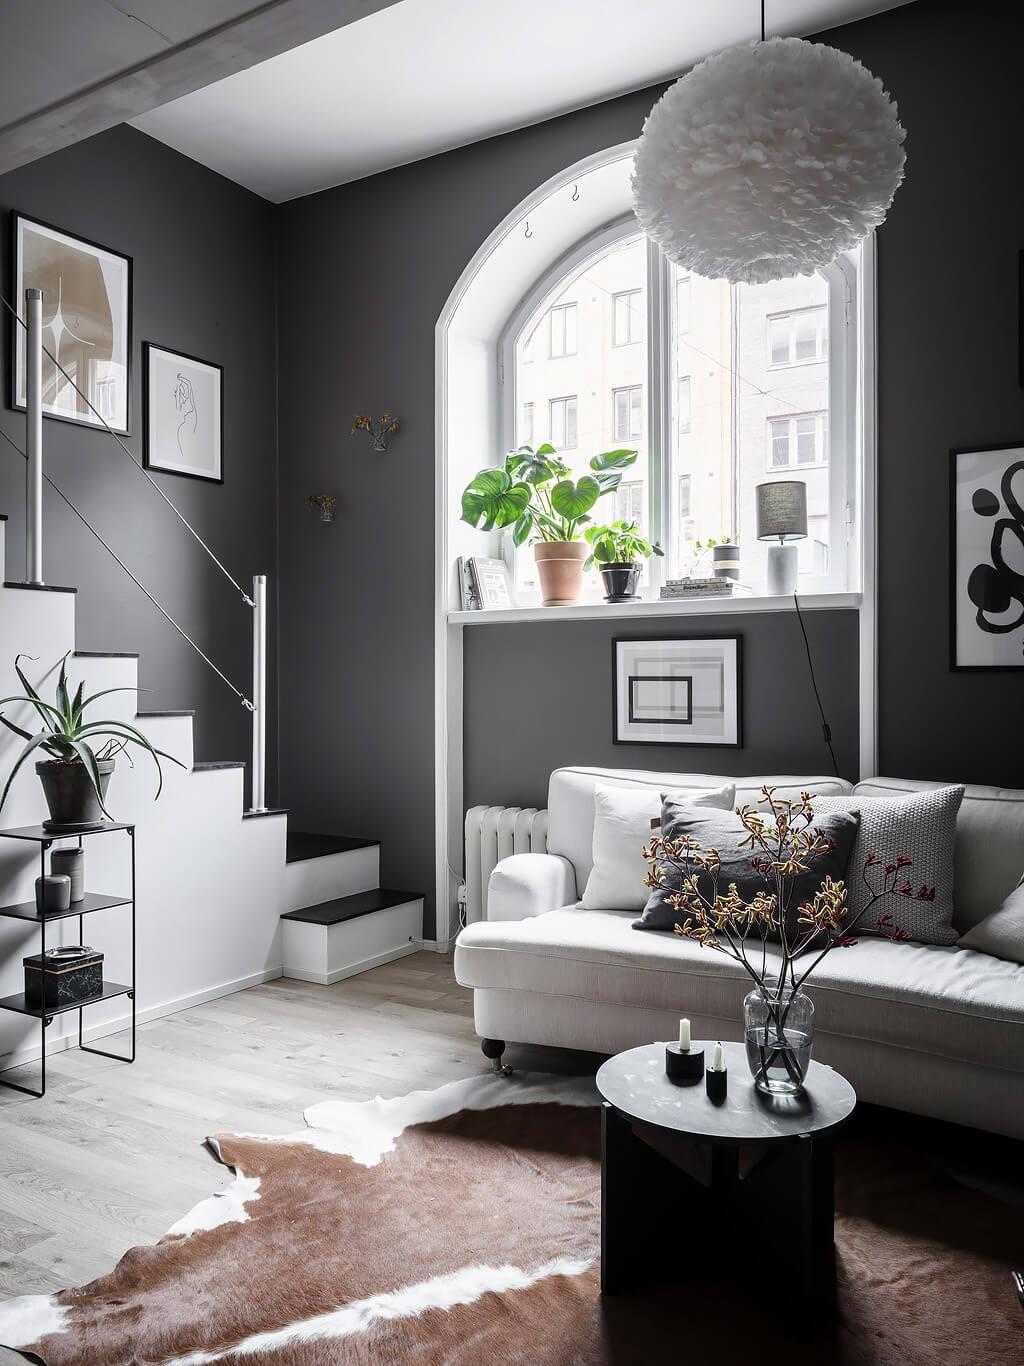 A Tiny Scandinavian Loft Apartment